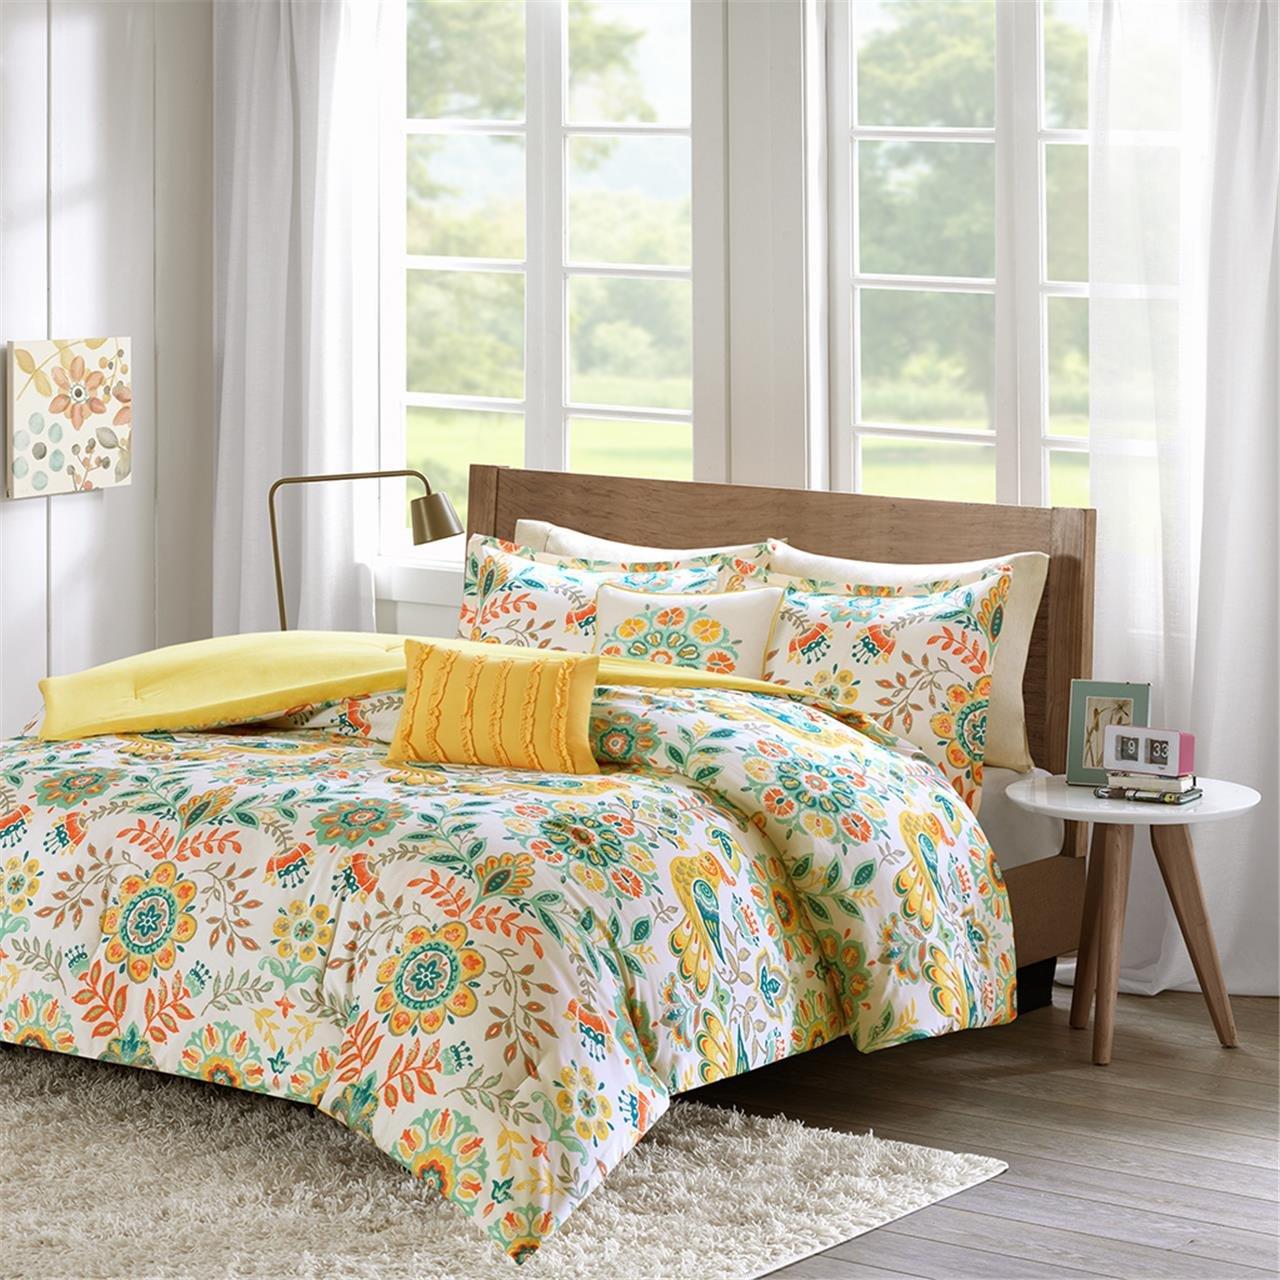 Intelligent Design ID10-727 Nina Comforter Set Twin/Twin X-Large Multi,Twin/XL E&E Co. Ltd DBA JLA Home